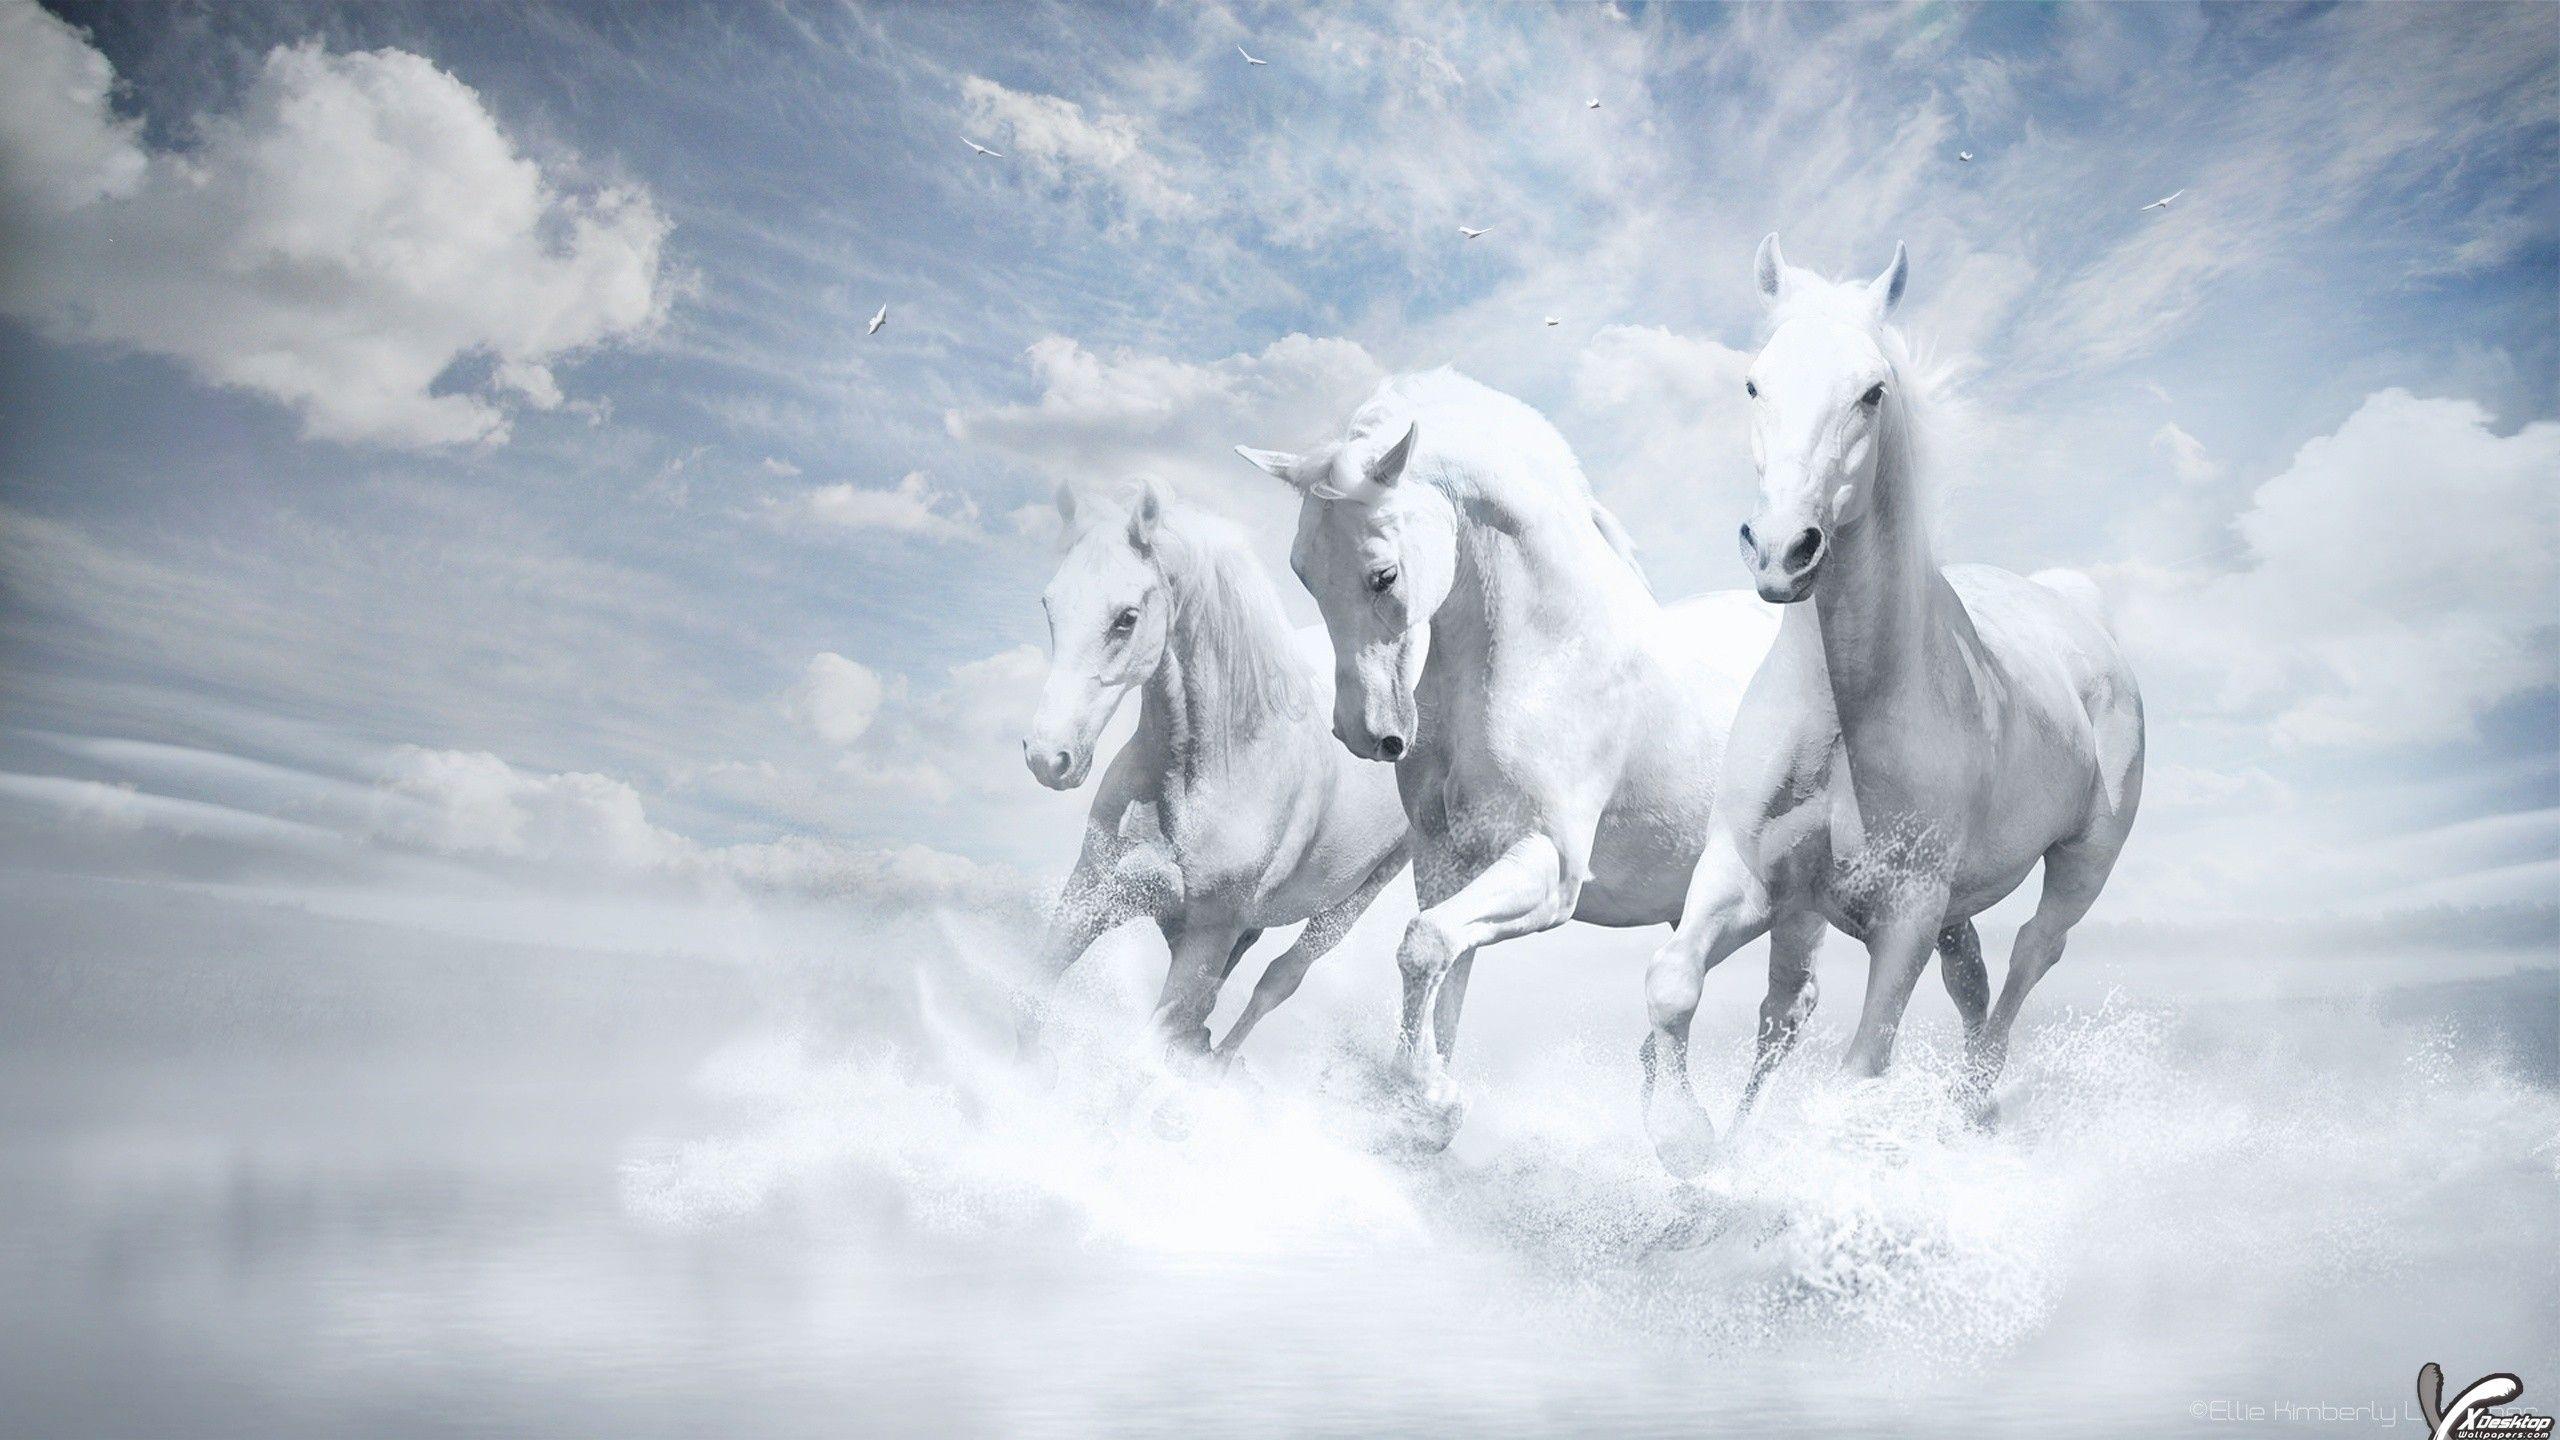 Beautiful three white horses running into water wallpapers white horses hd wallpapers white horses hd wallpapers for desktop mobile phones in hd widescreen high quality resolutions altavistaventures Gallery